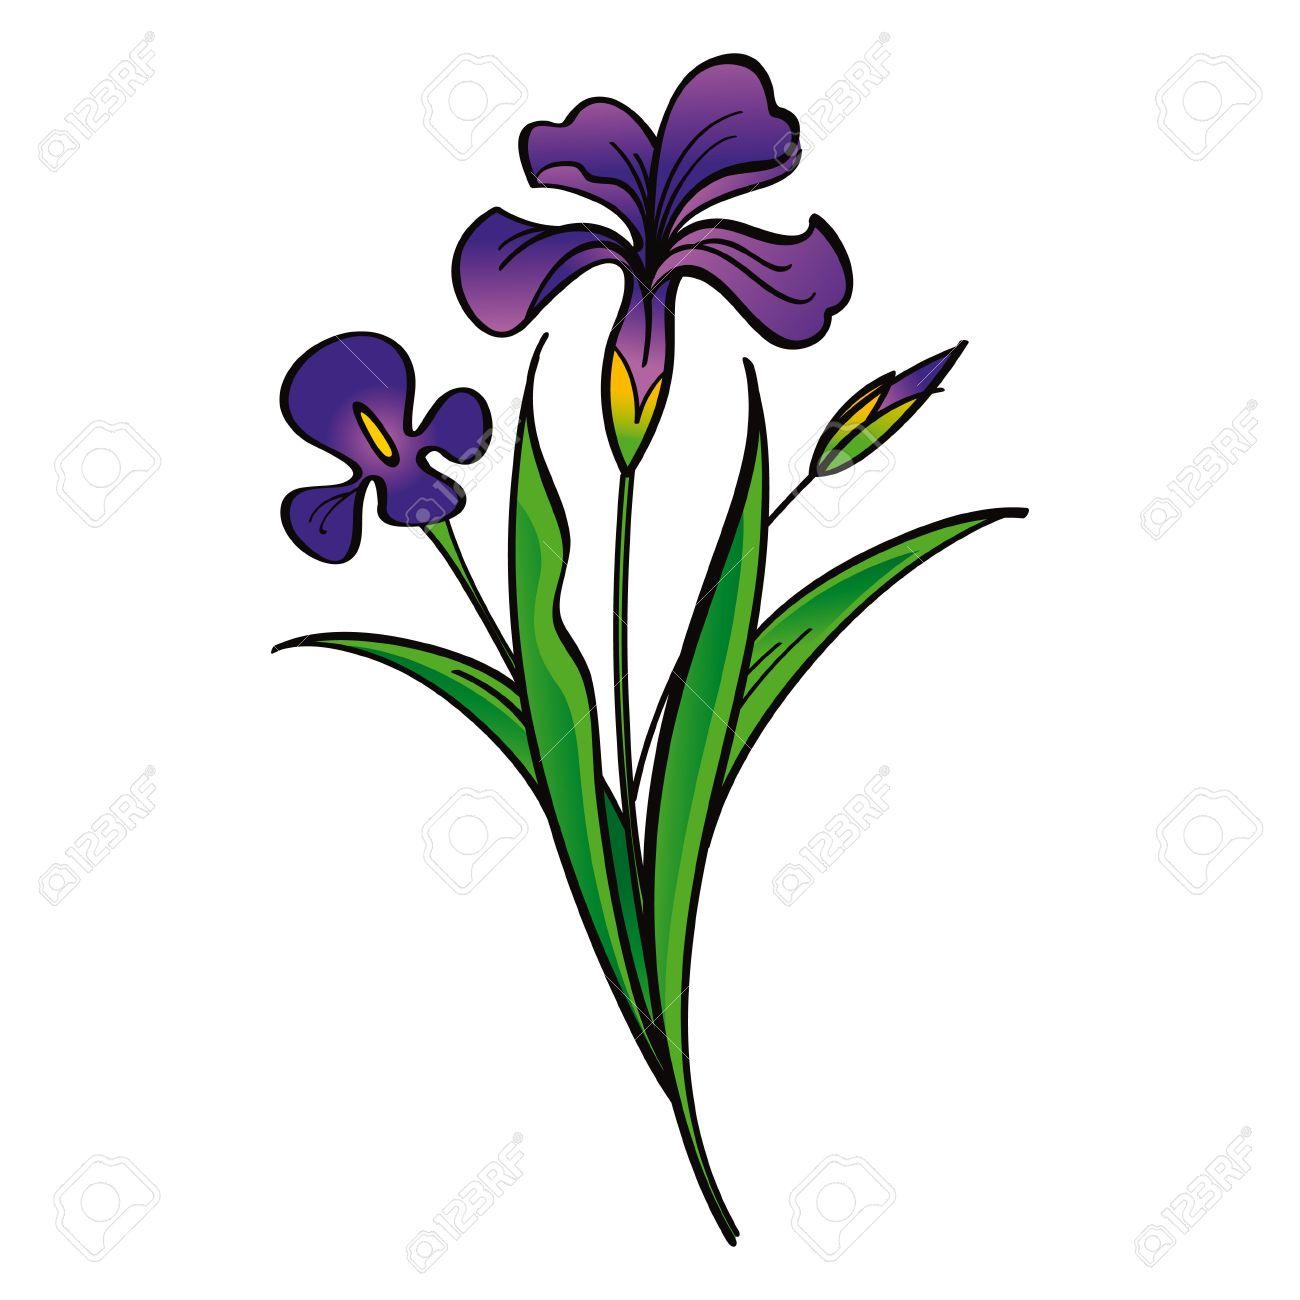 Iris clip art.